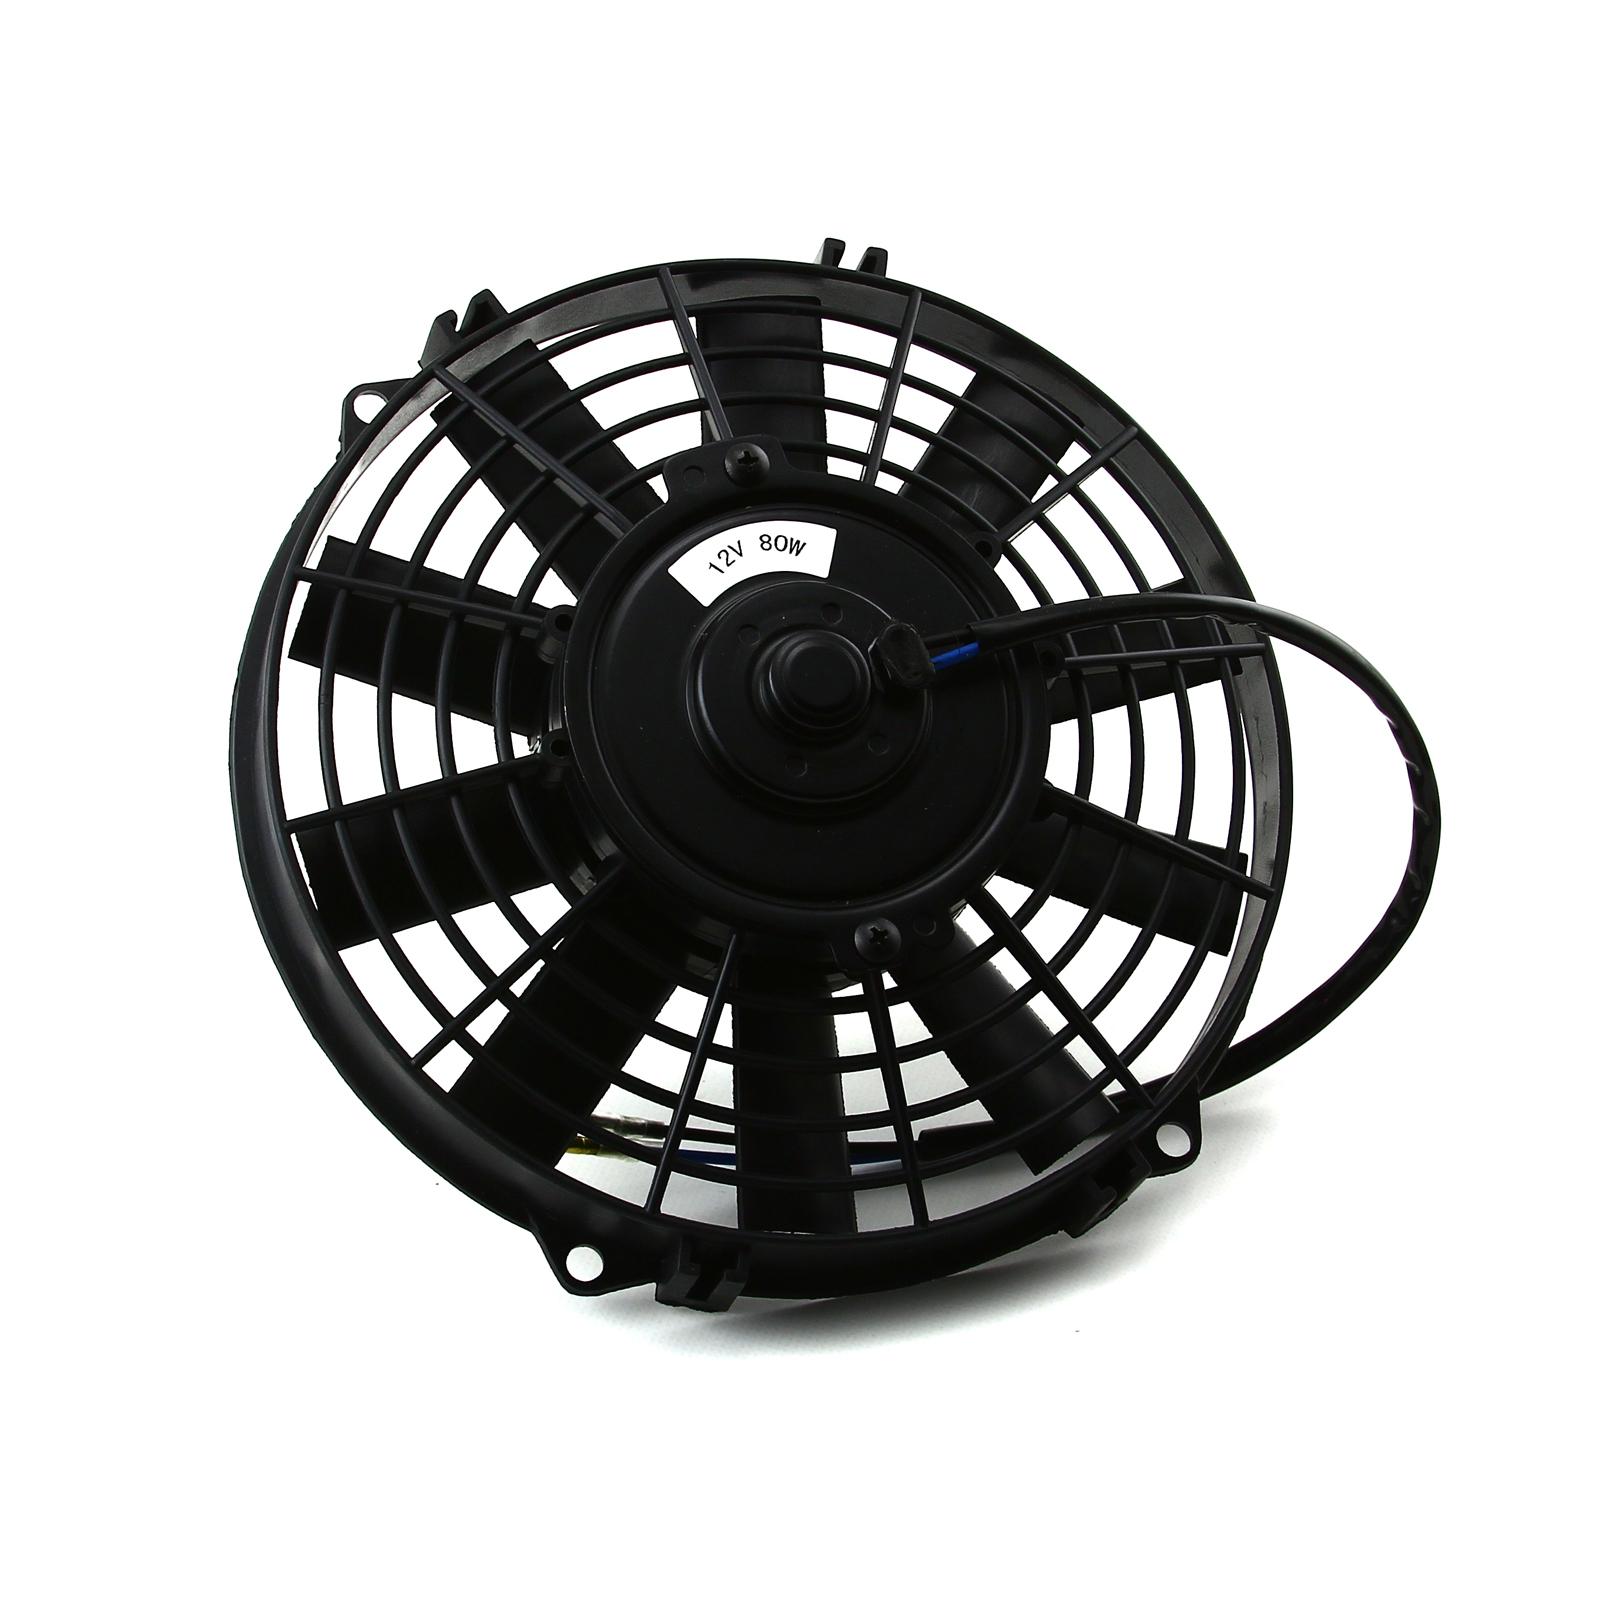 12v Blower Fan 500 Cfm : Quot reversable v radiator electric thermo fan